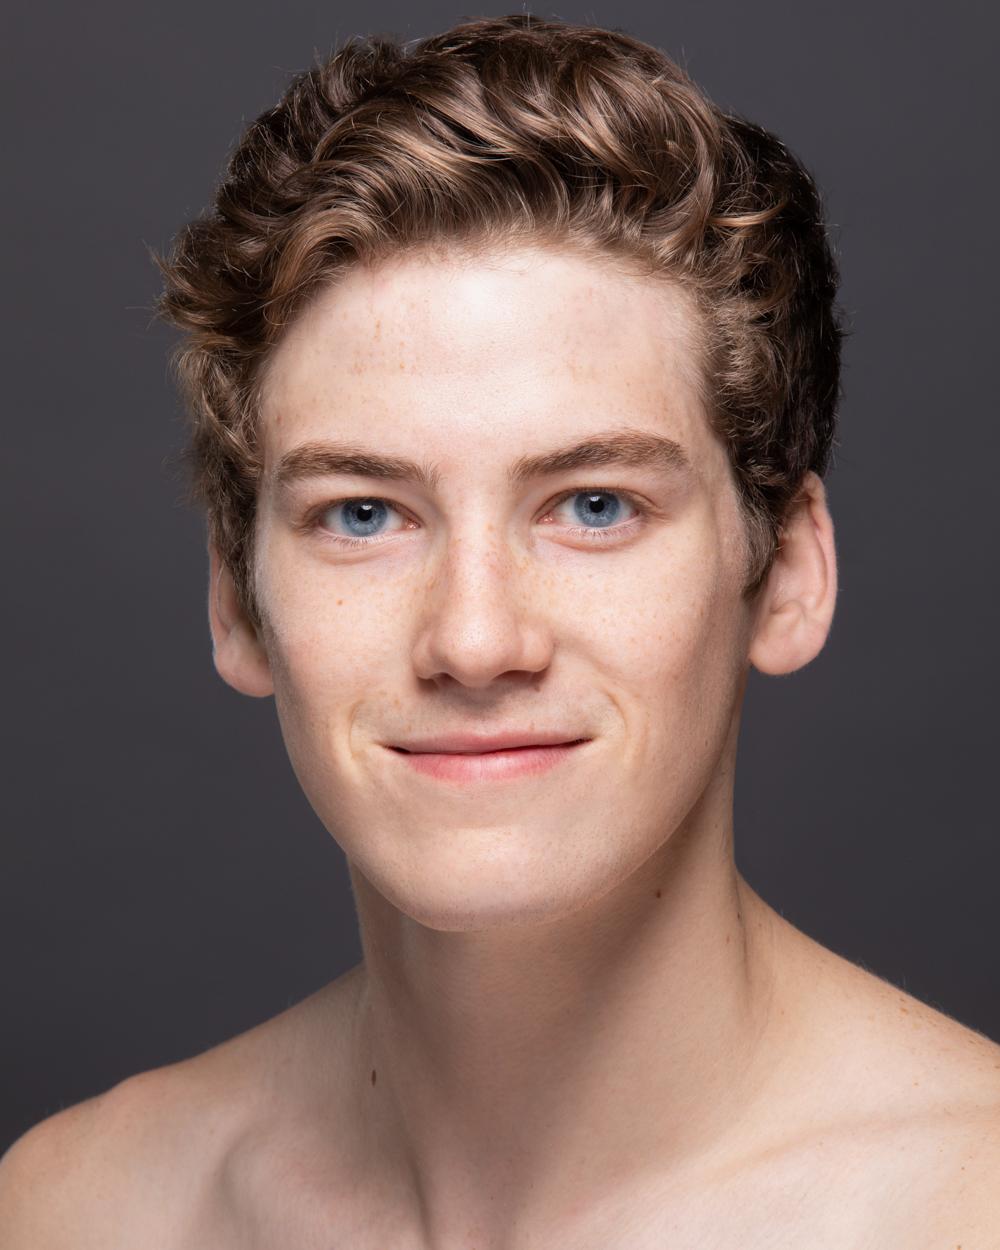 Ryan Lenkey